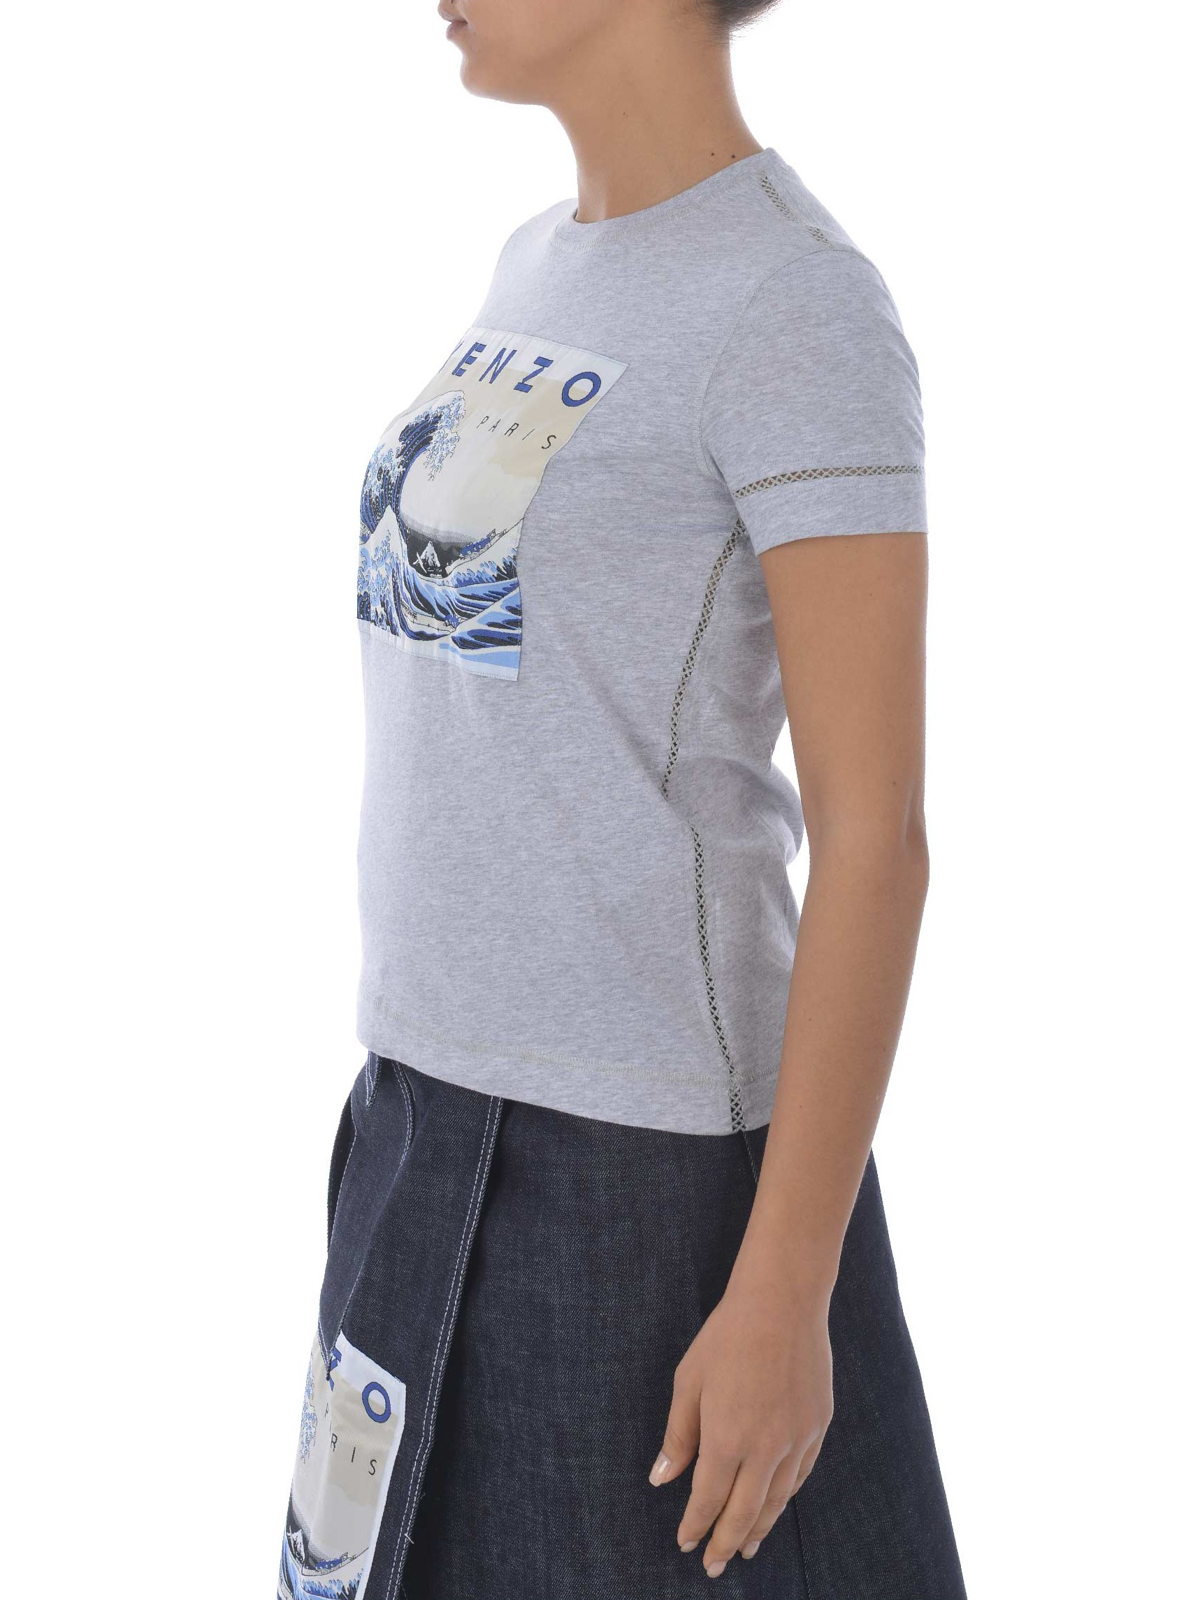 9b72fe5b9606 Kenzo - Kanagawa Wave T-shirt - t-shirts - F851TS749995 93 | iKRIX.com